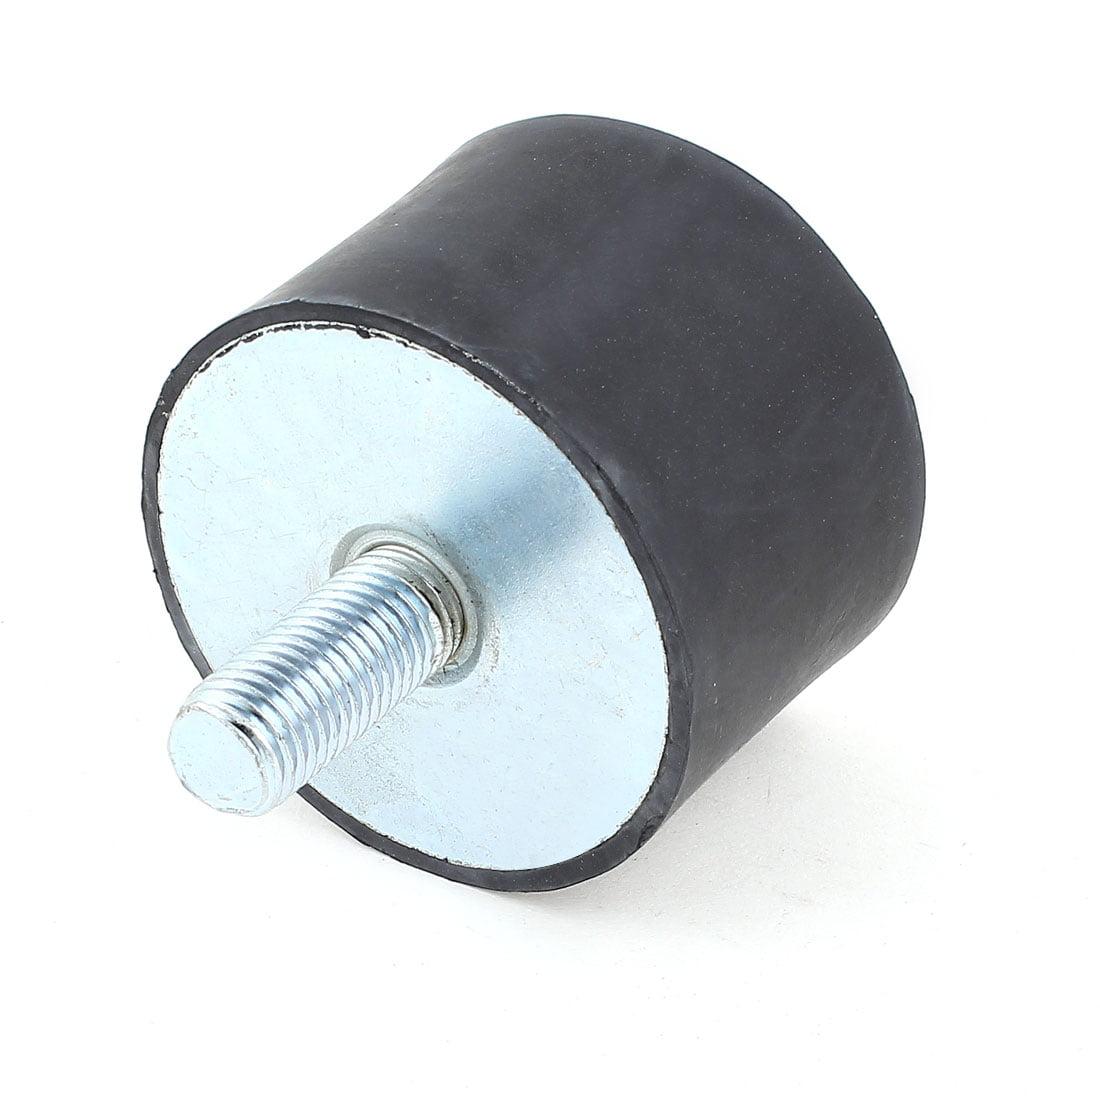 M16 Male Female Anti Vibration Rubber Mounts Isolators 75mm x 50mm